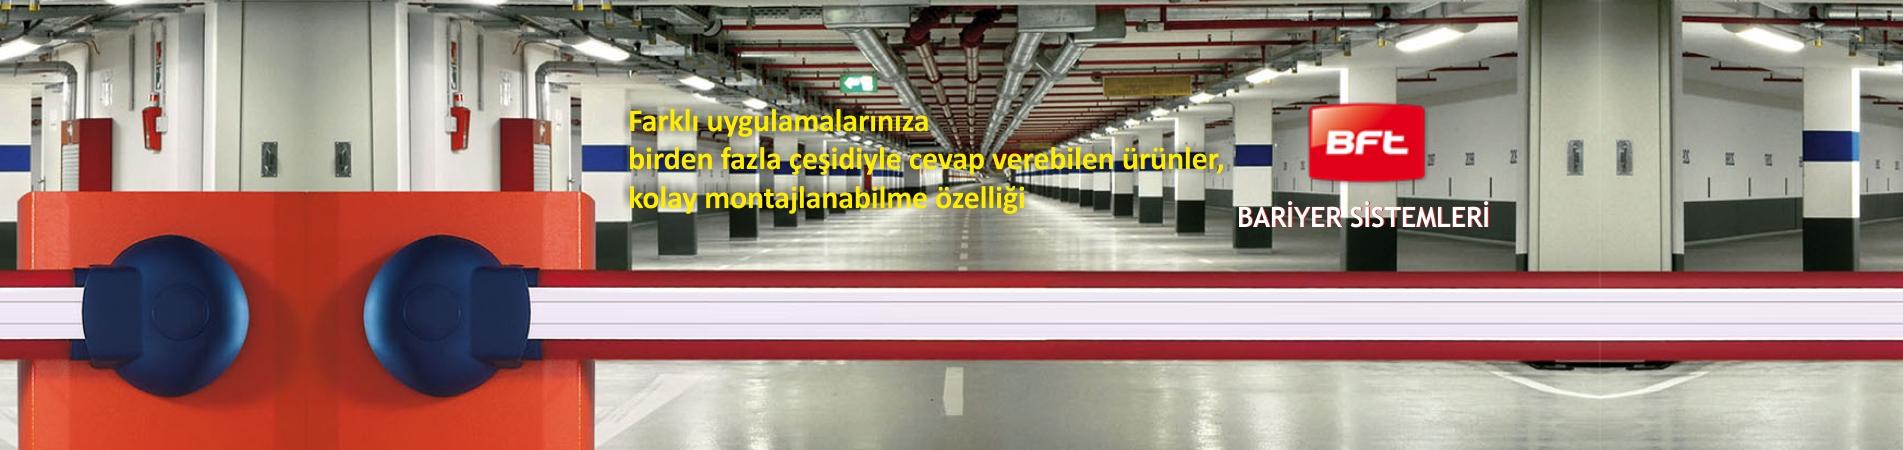 slidebg2